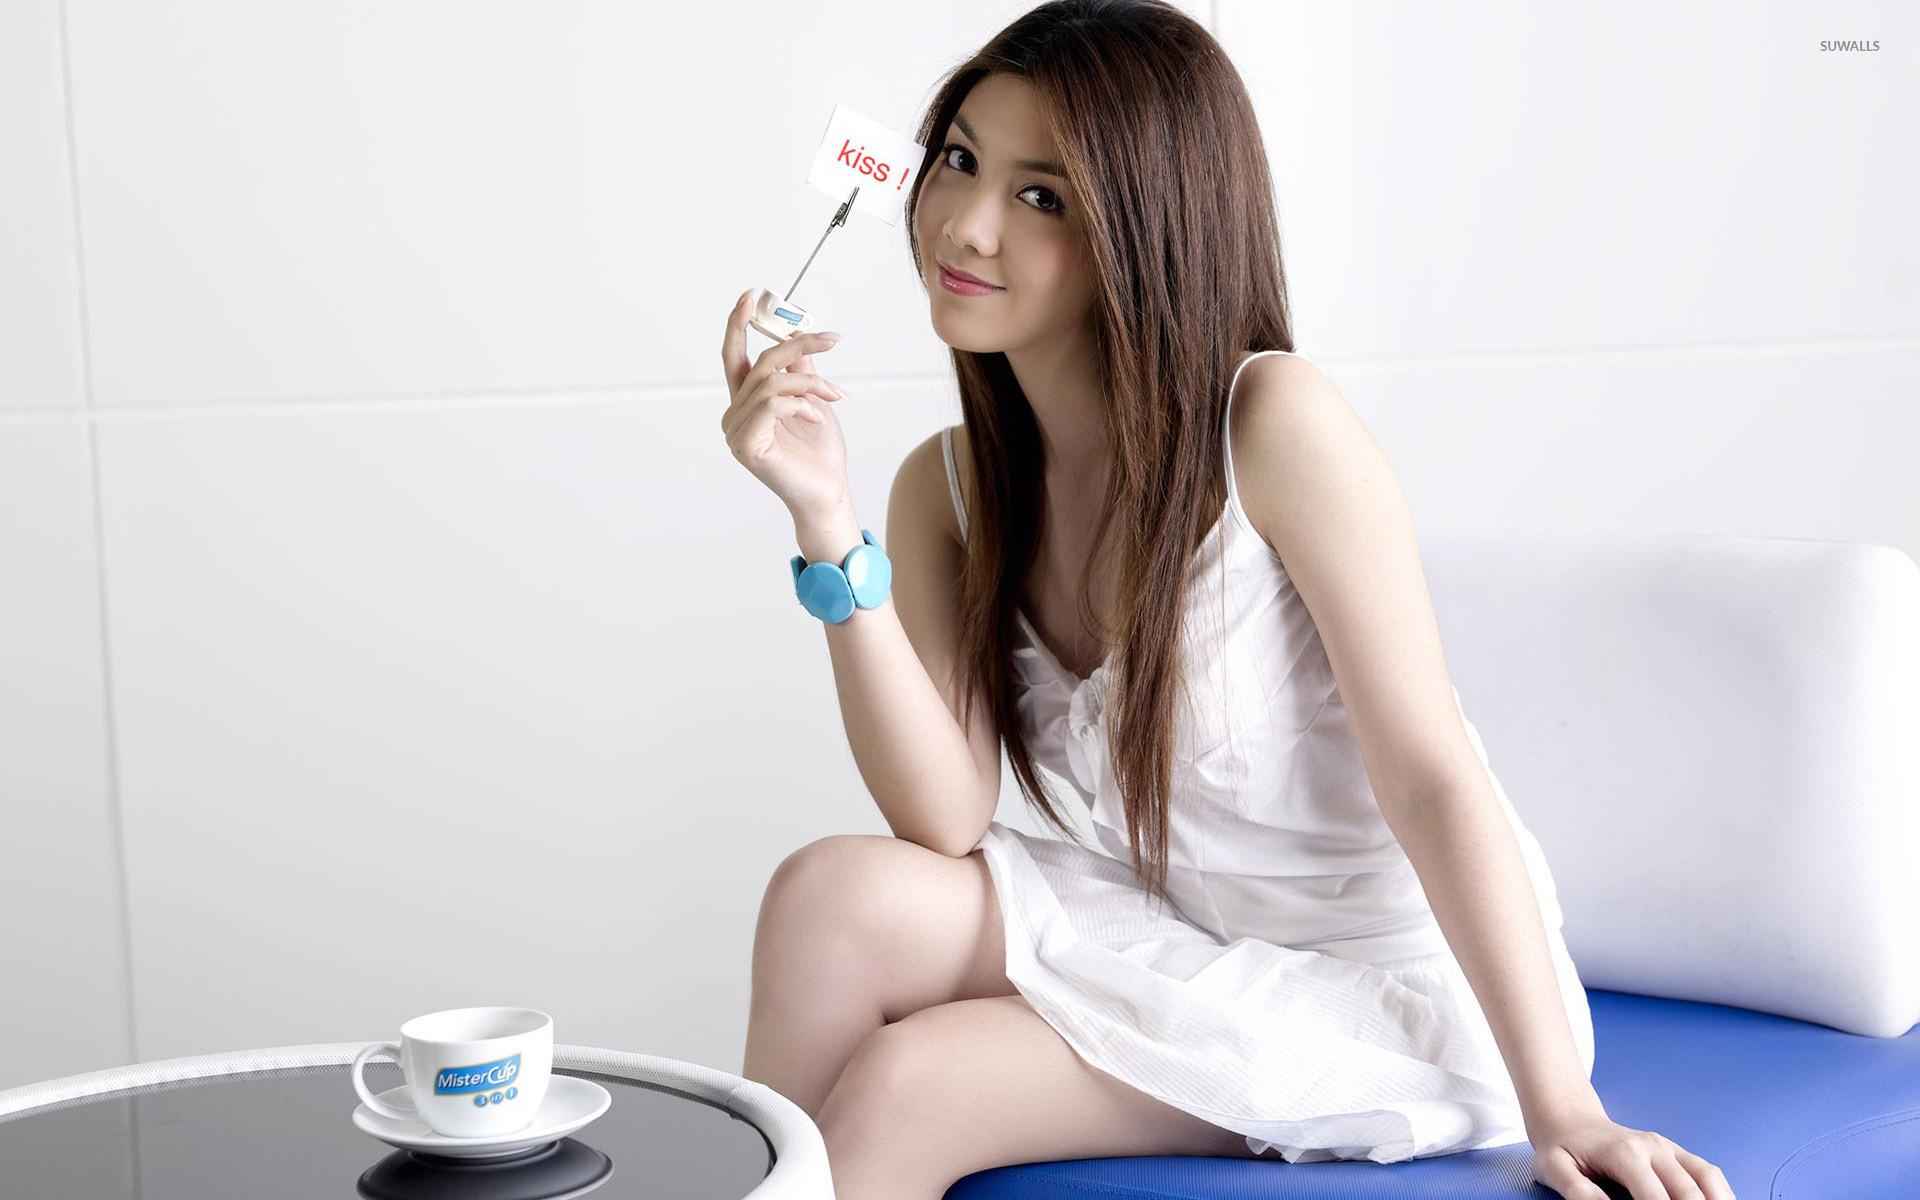 Cute asian girl wallpaper - Girl wallpapers - #35340